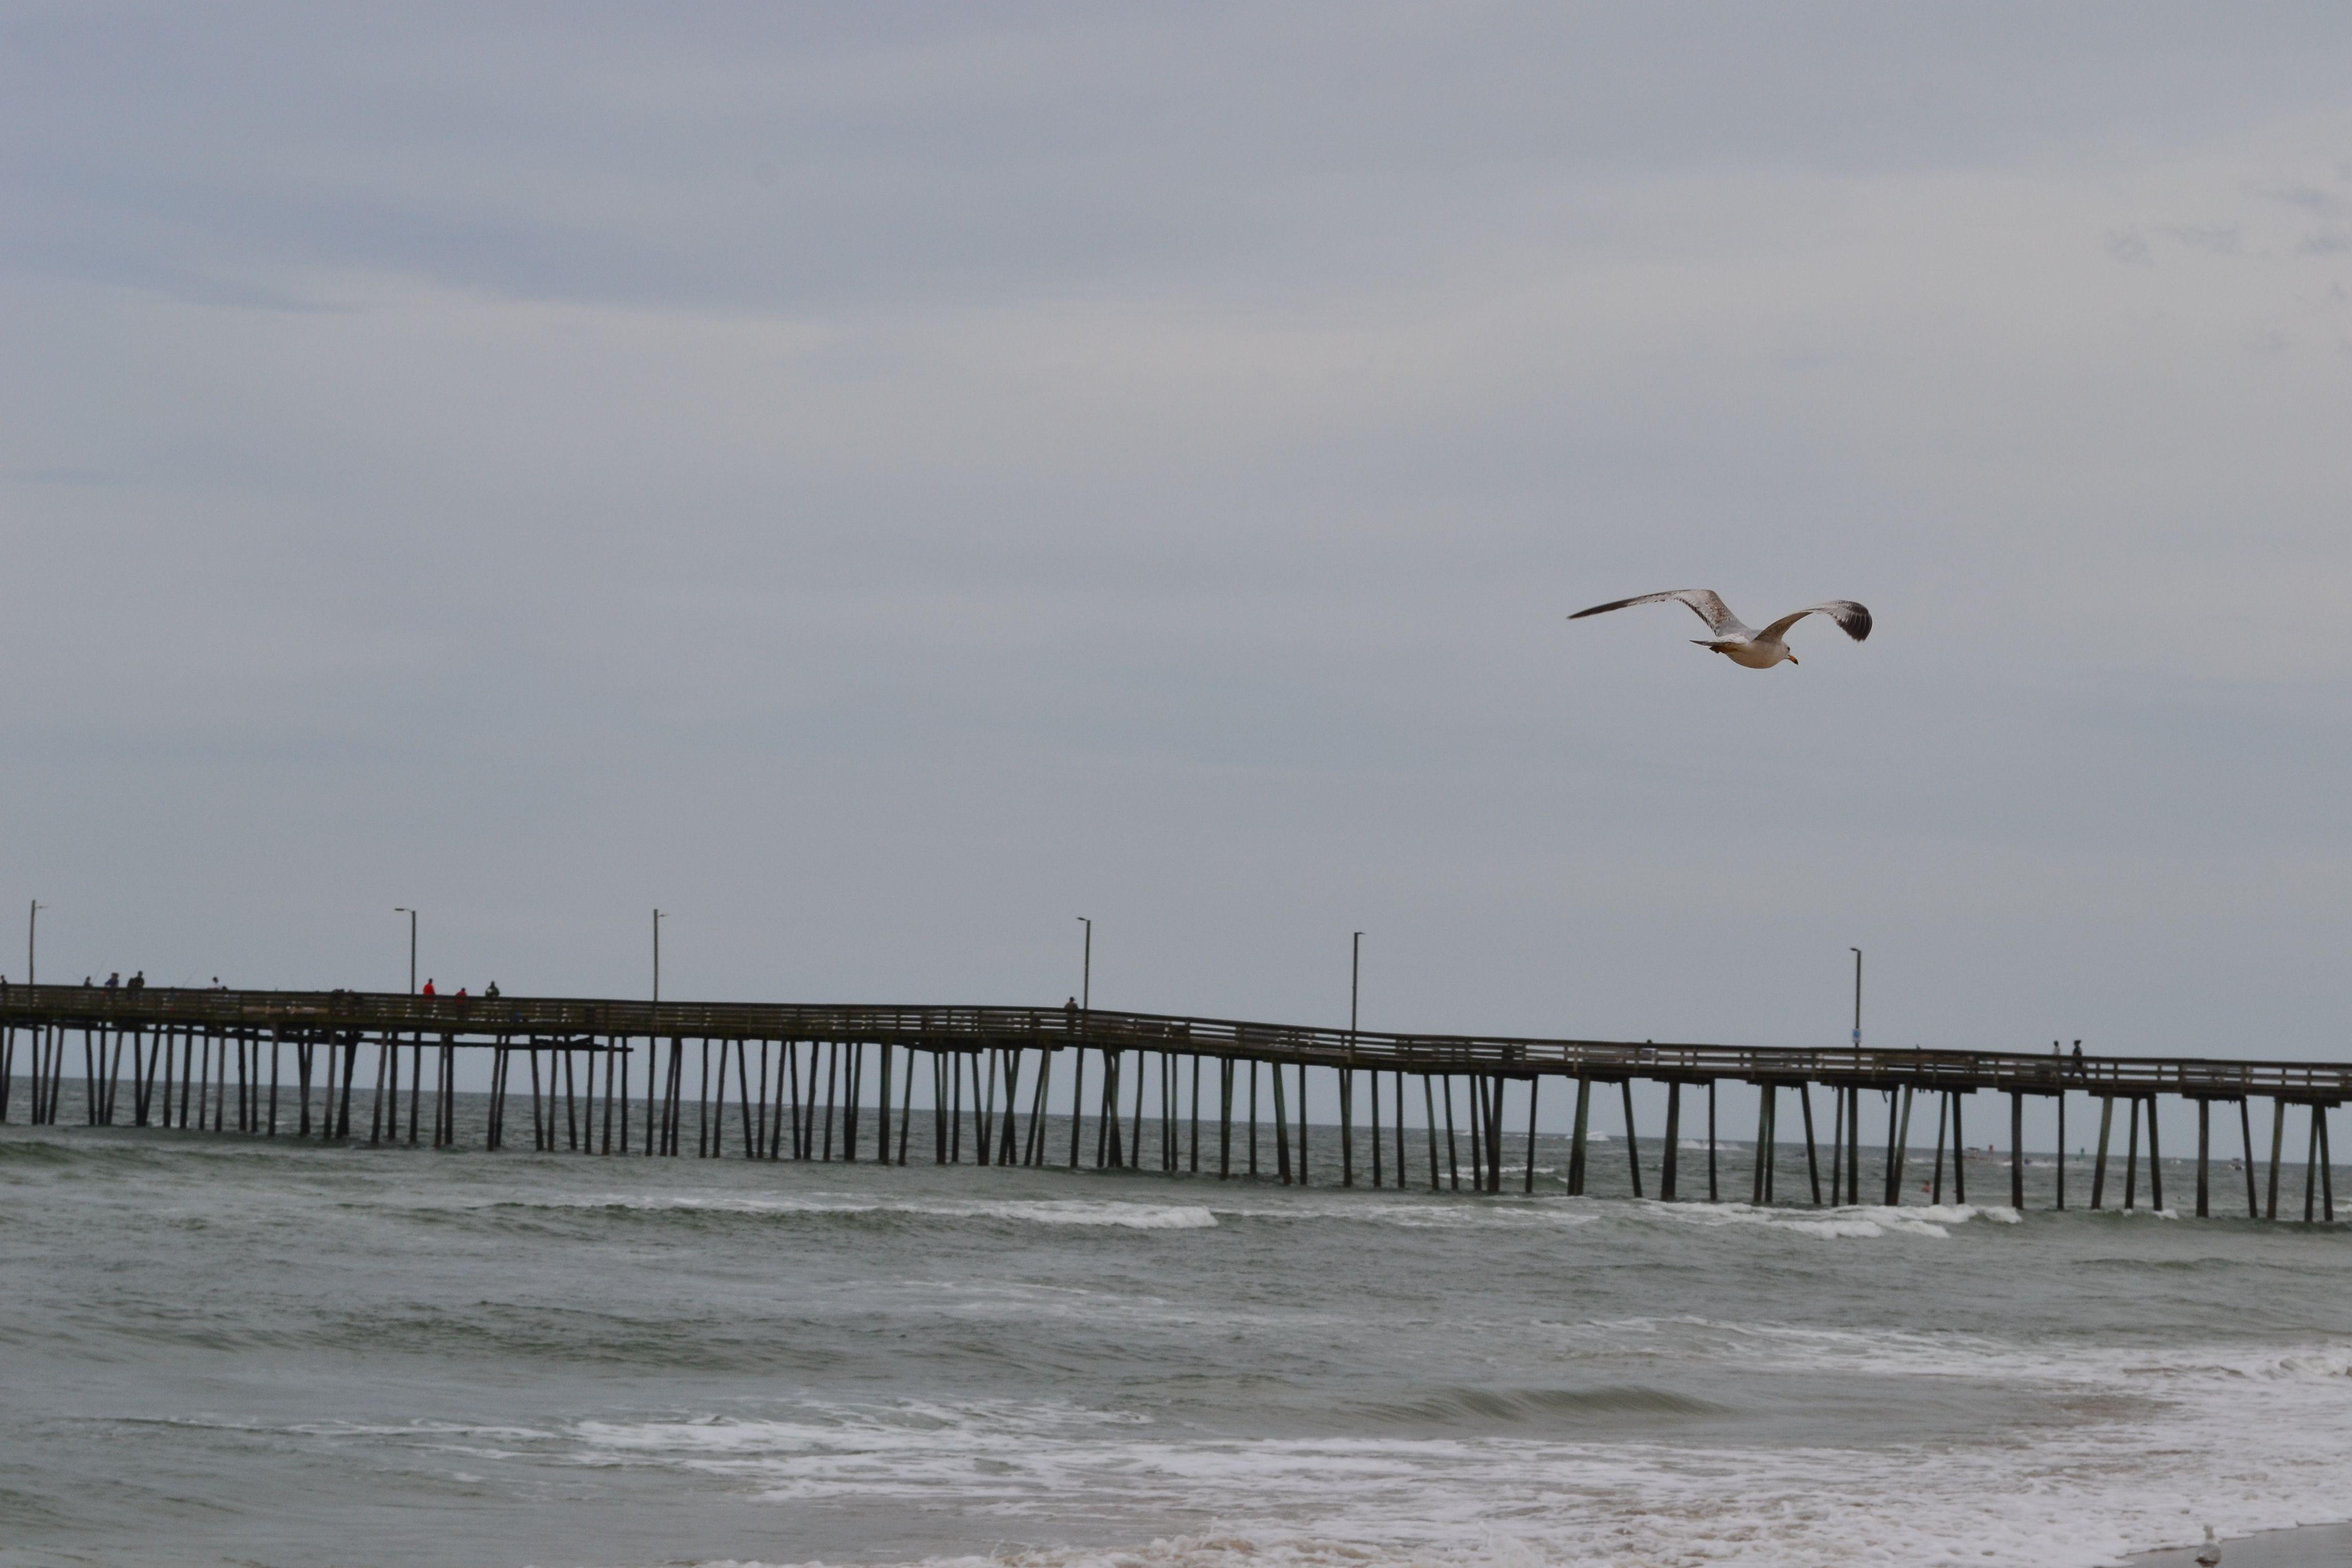 Fishing Pier At Virginia Beach Taken During A Trip A Few Years